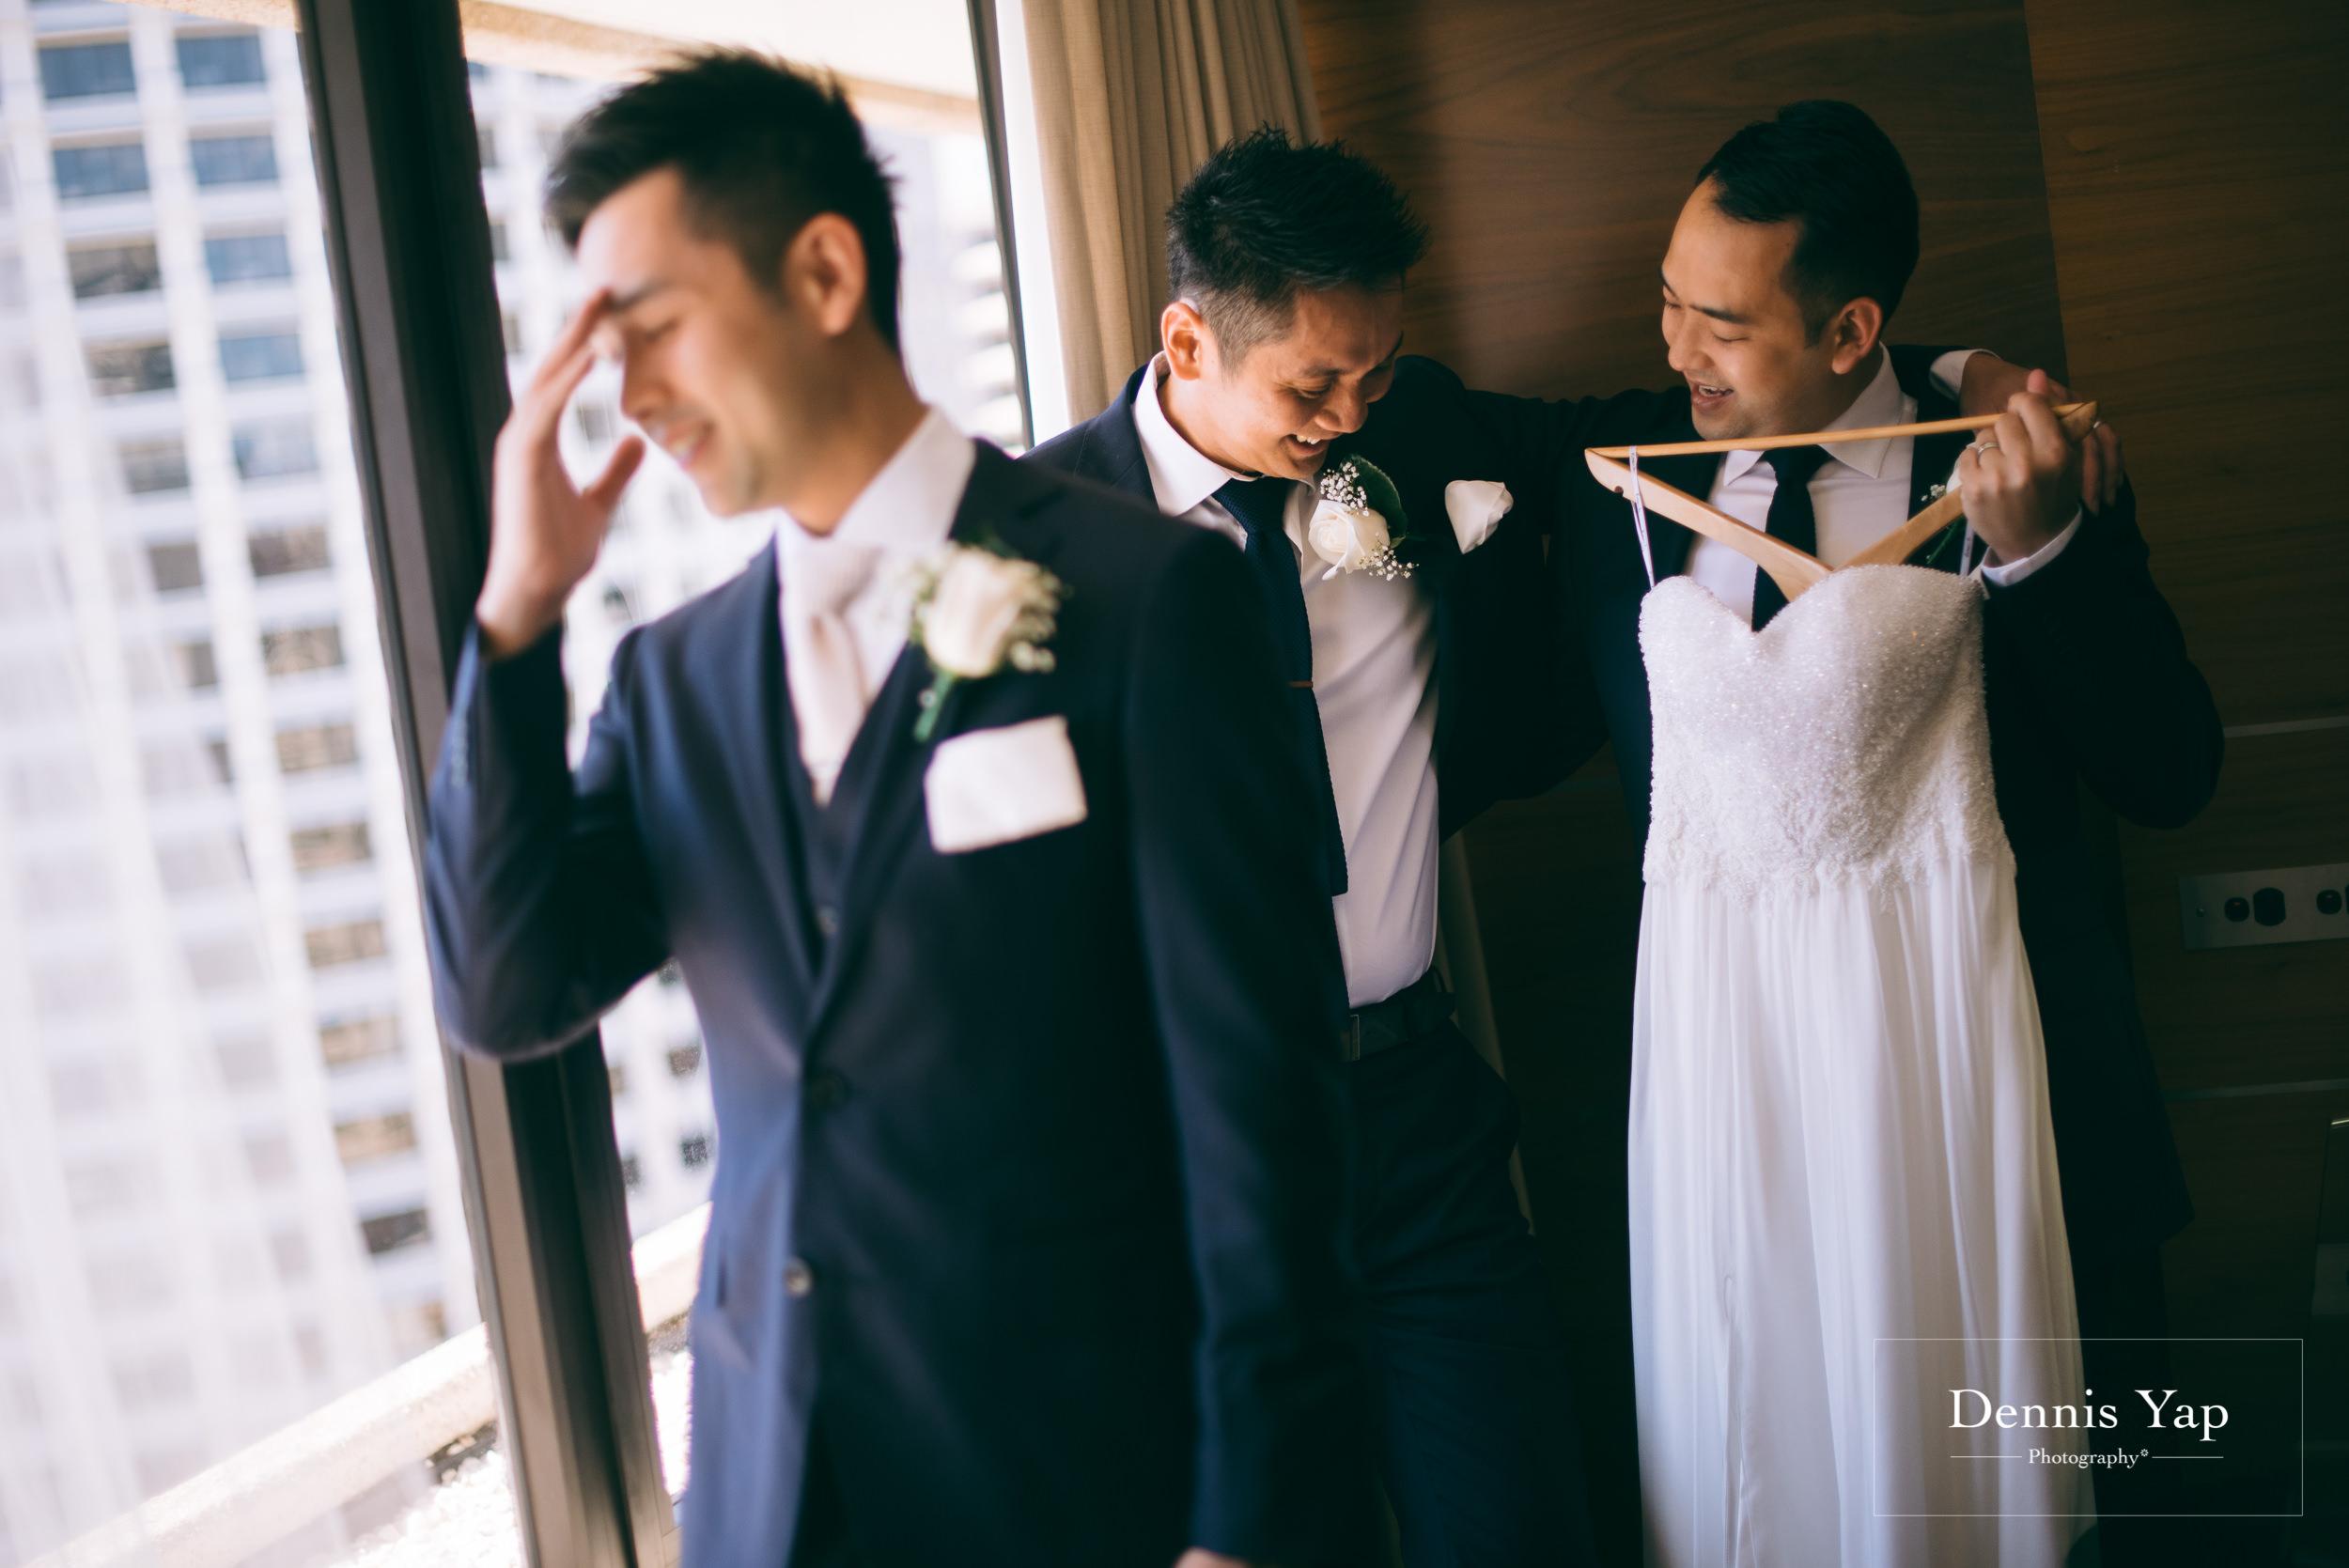 thang veng vietnamese wedding brisbane dennis yap photography malaysia wedding photographer-12.jpg